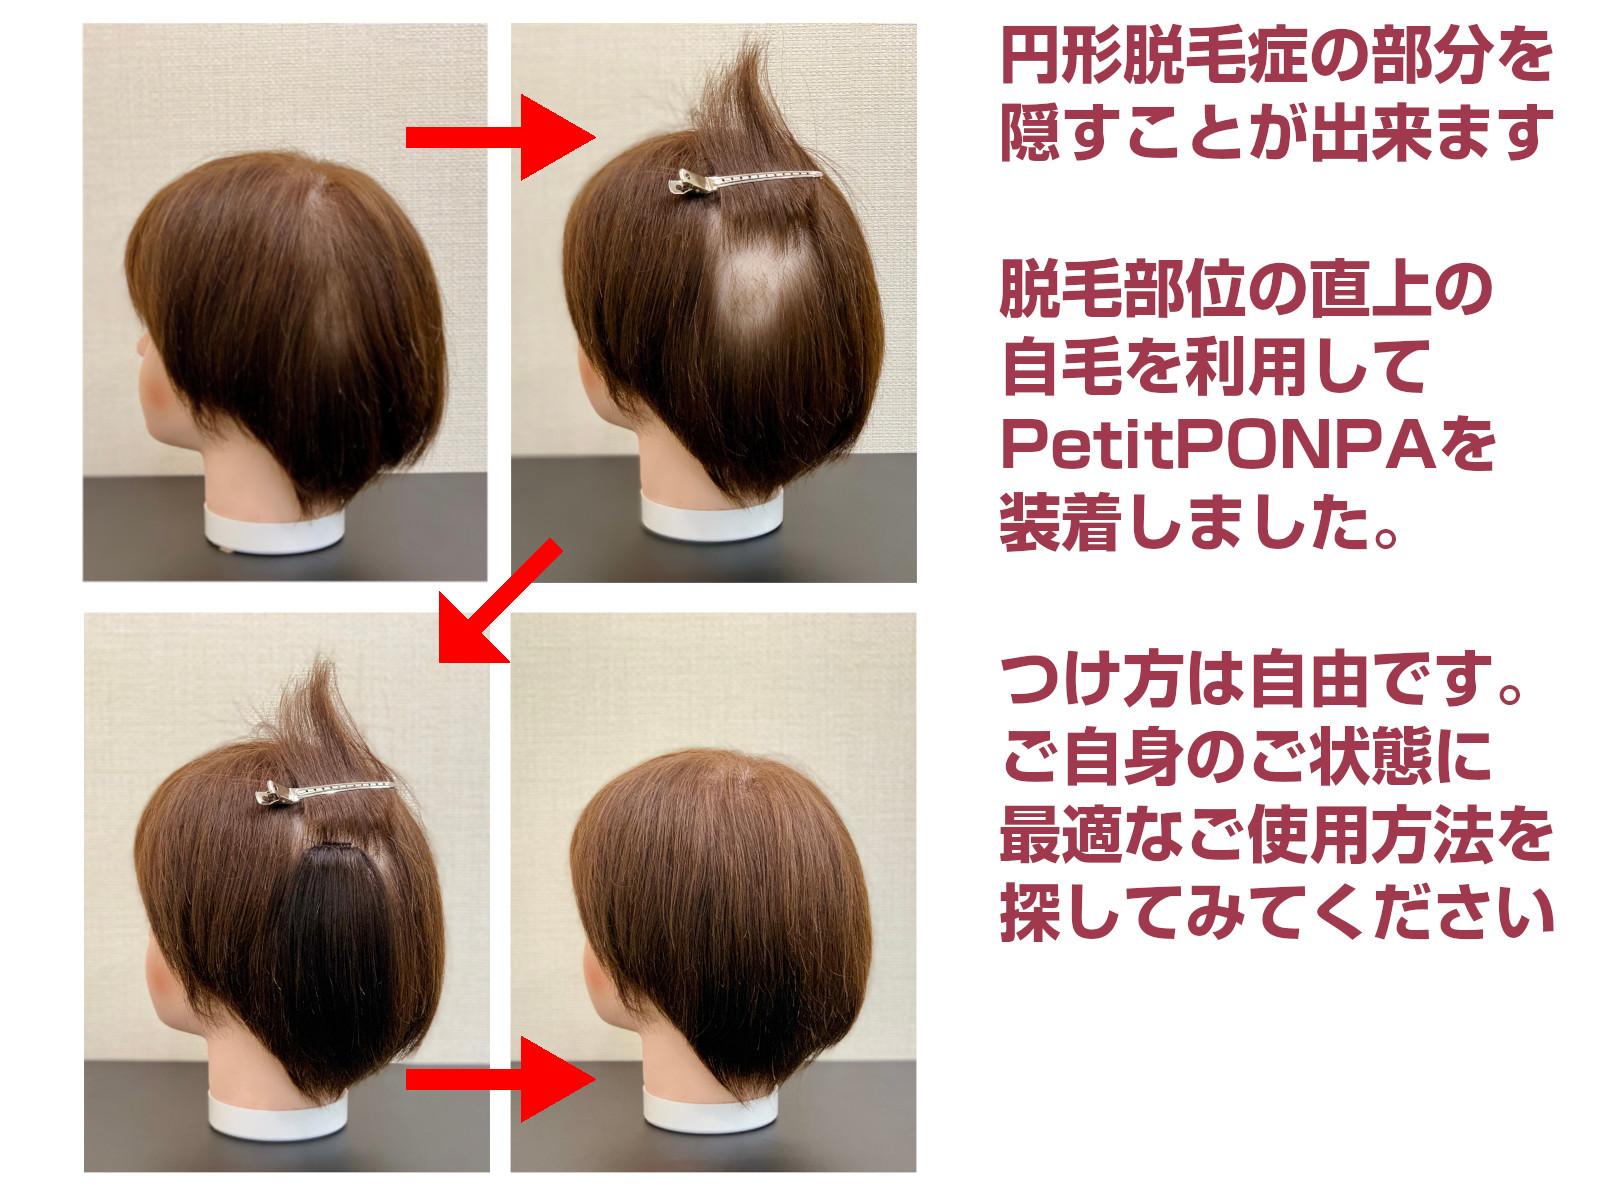 「PetitPON-PA(プチポンパ)」で円形脱毛をカバーしてみました